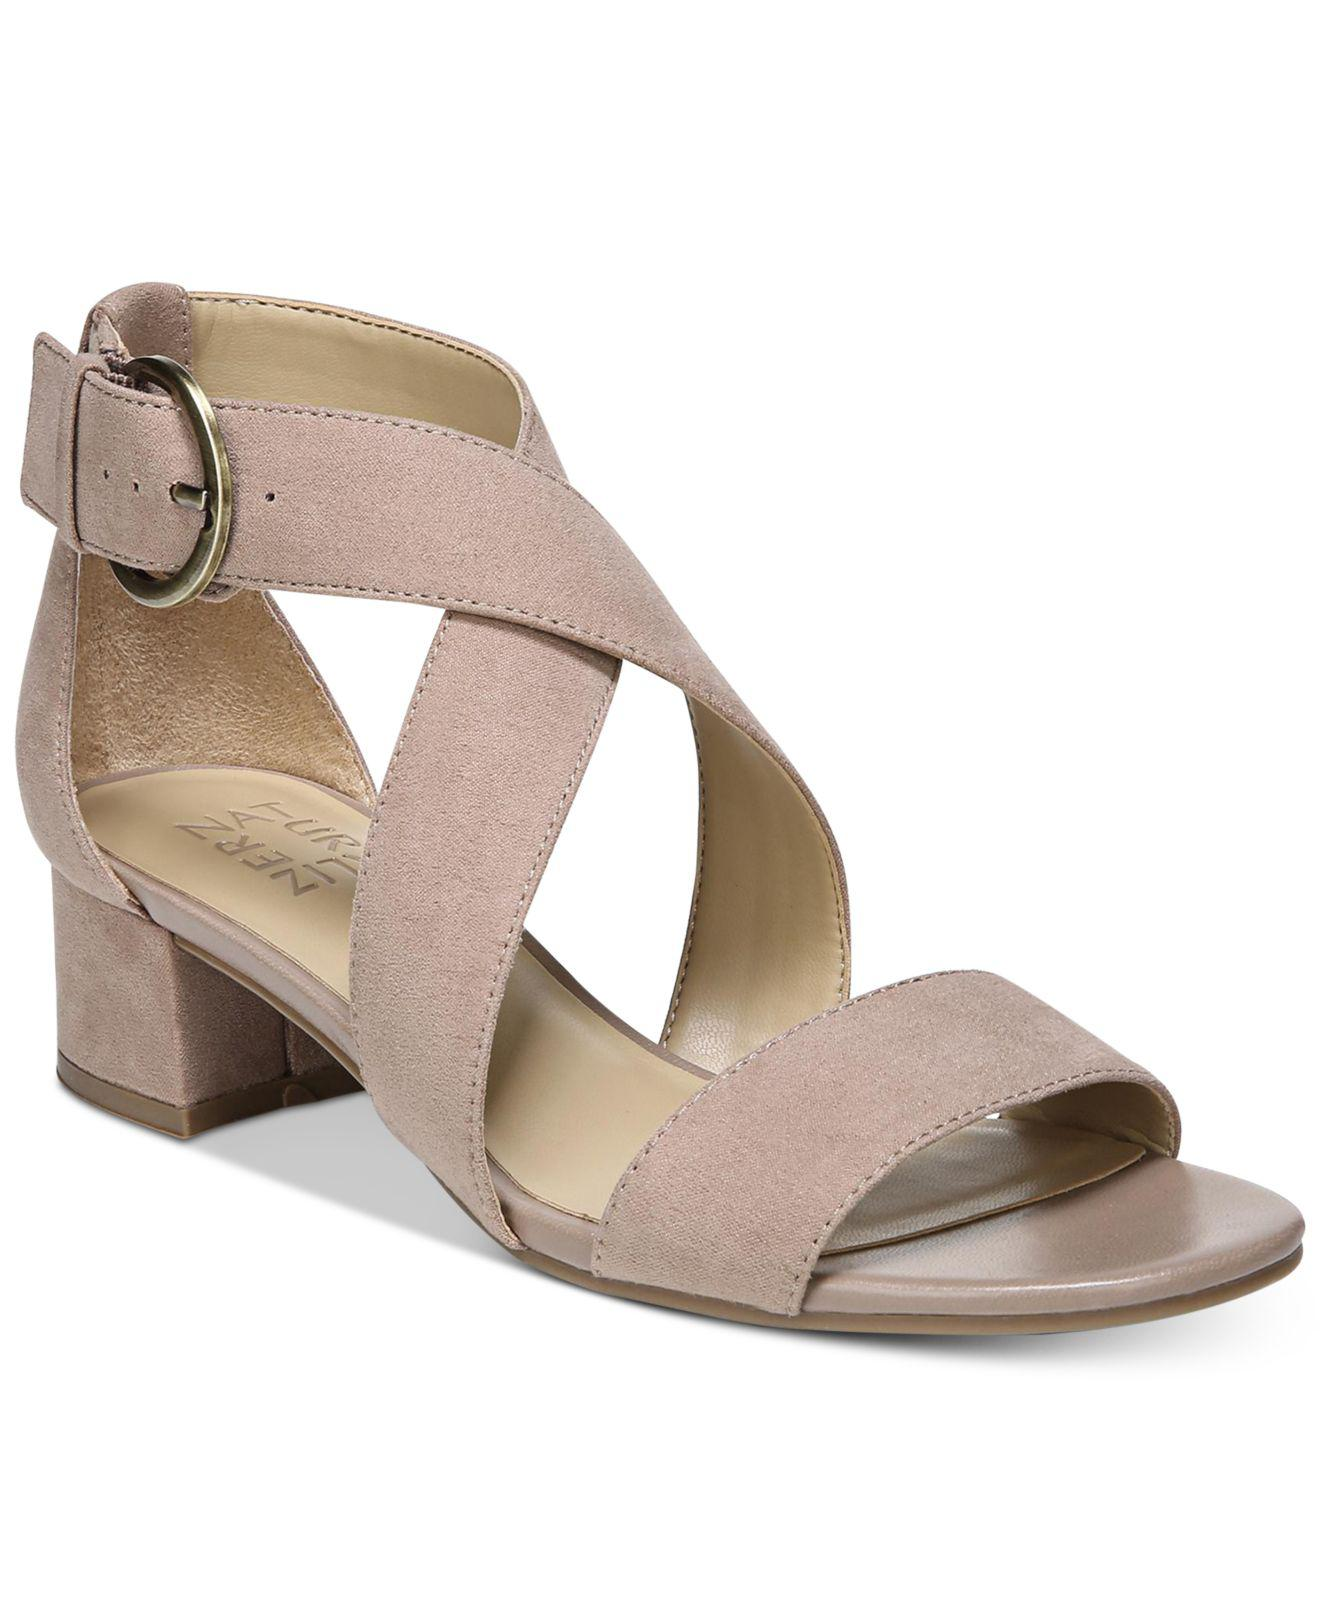 Naturalizer Devin Dress Sandals Women's Shoes n8PDhn